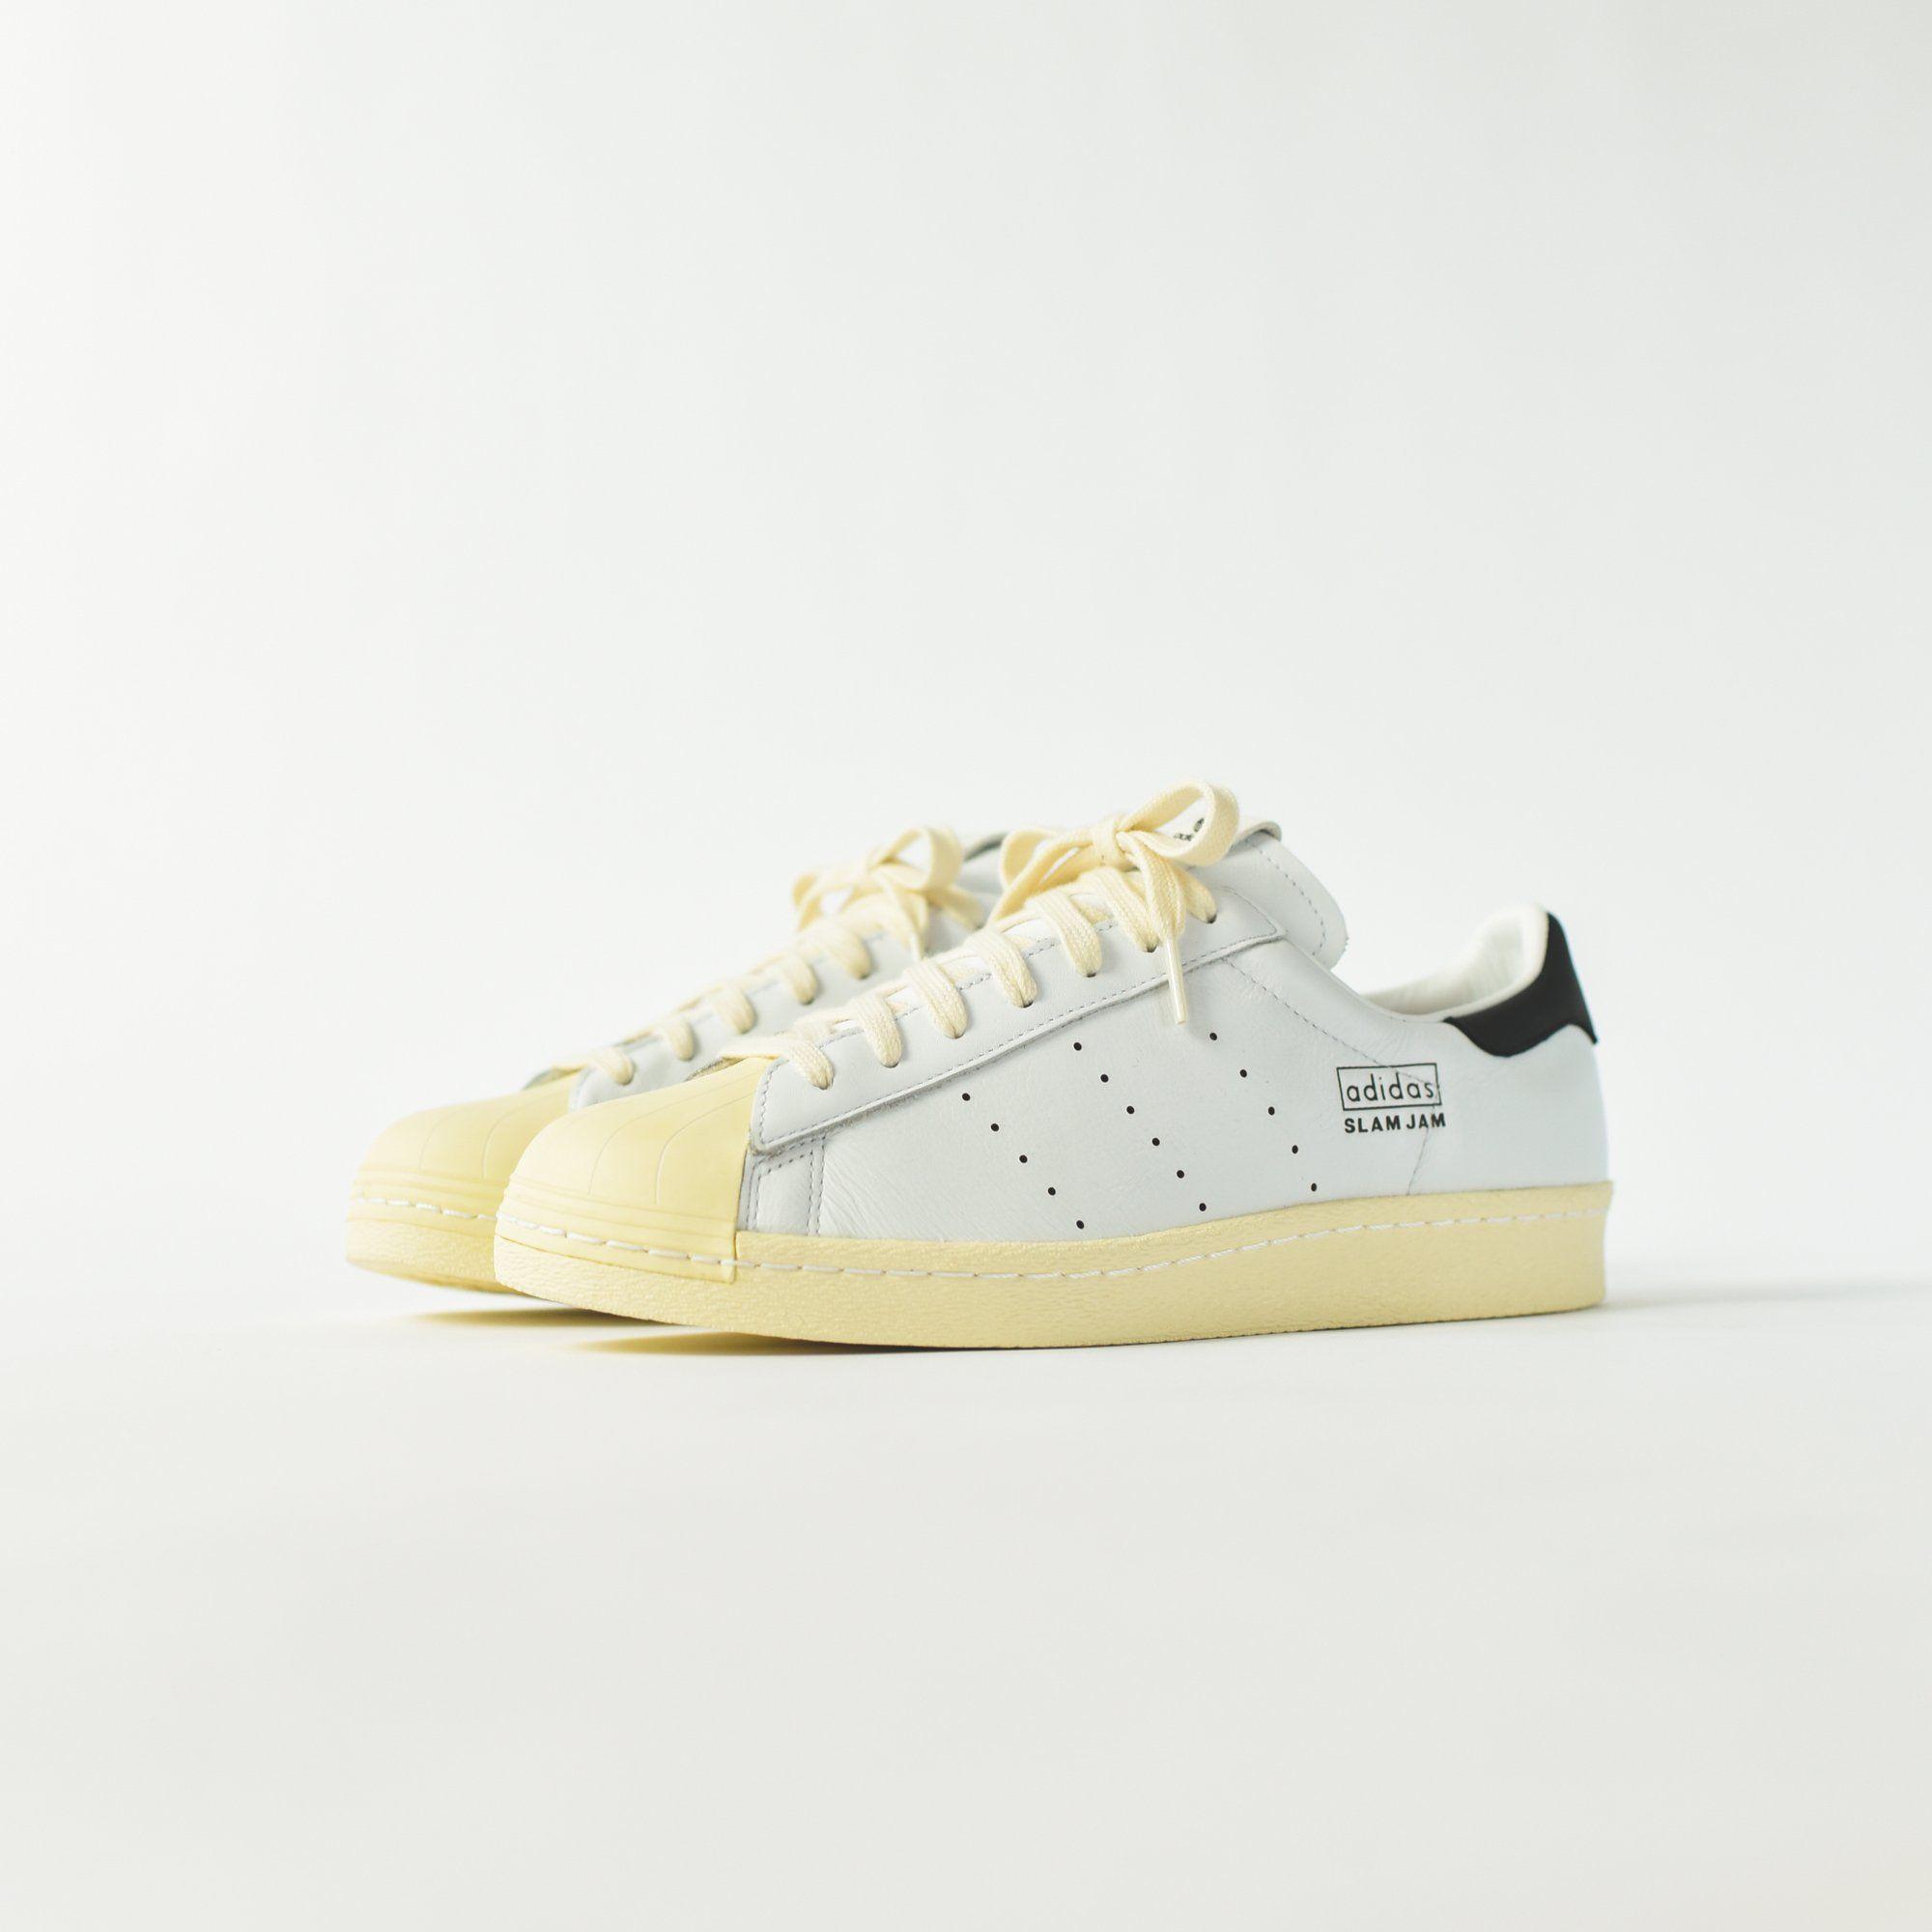 67628c26e adidas Consortium x Slam Jam Superstar 80s - White - 8